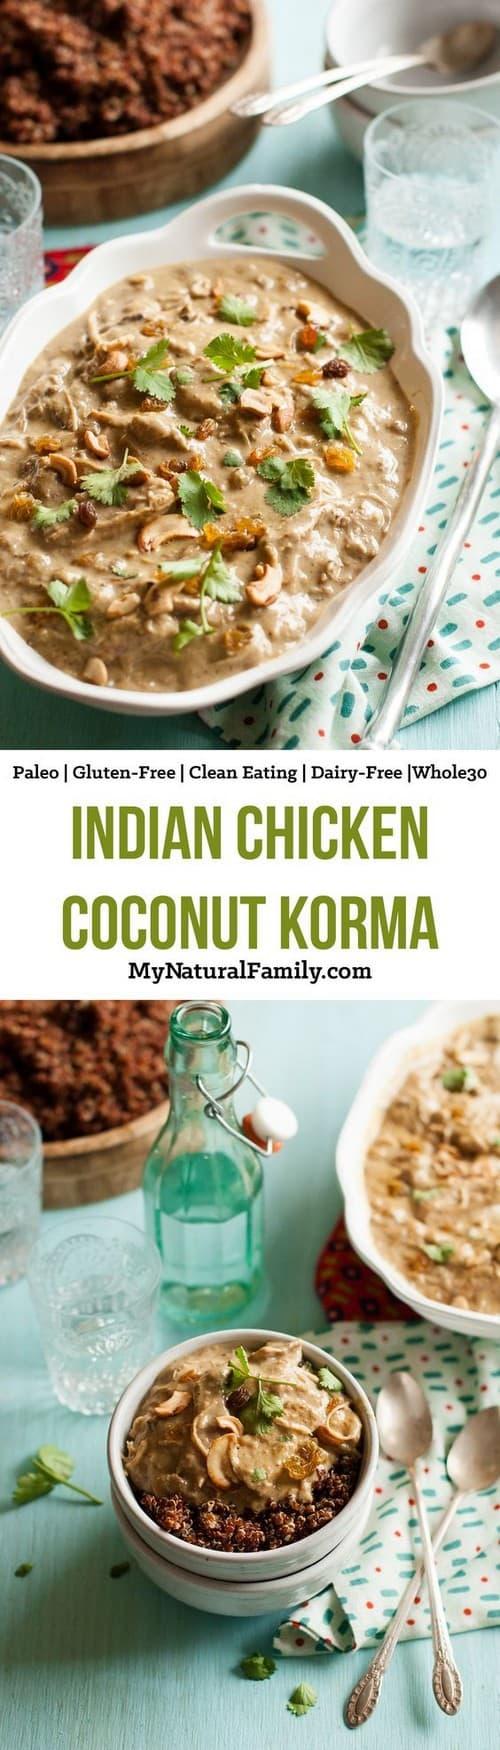 indian-chicken-coconut-korma-recipe